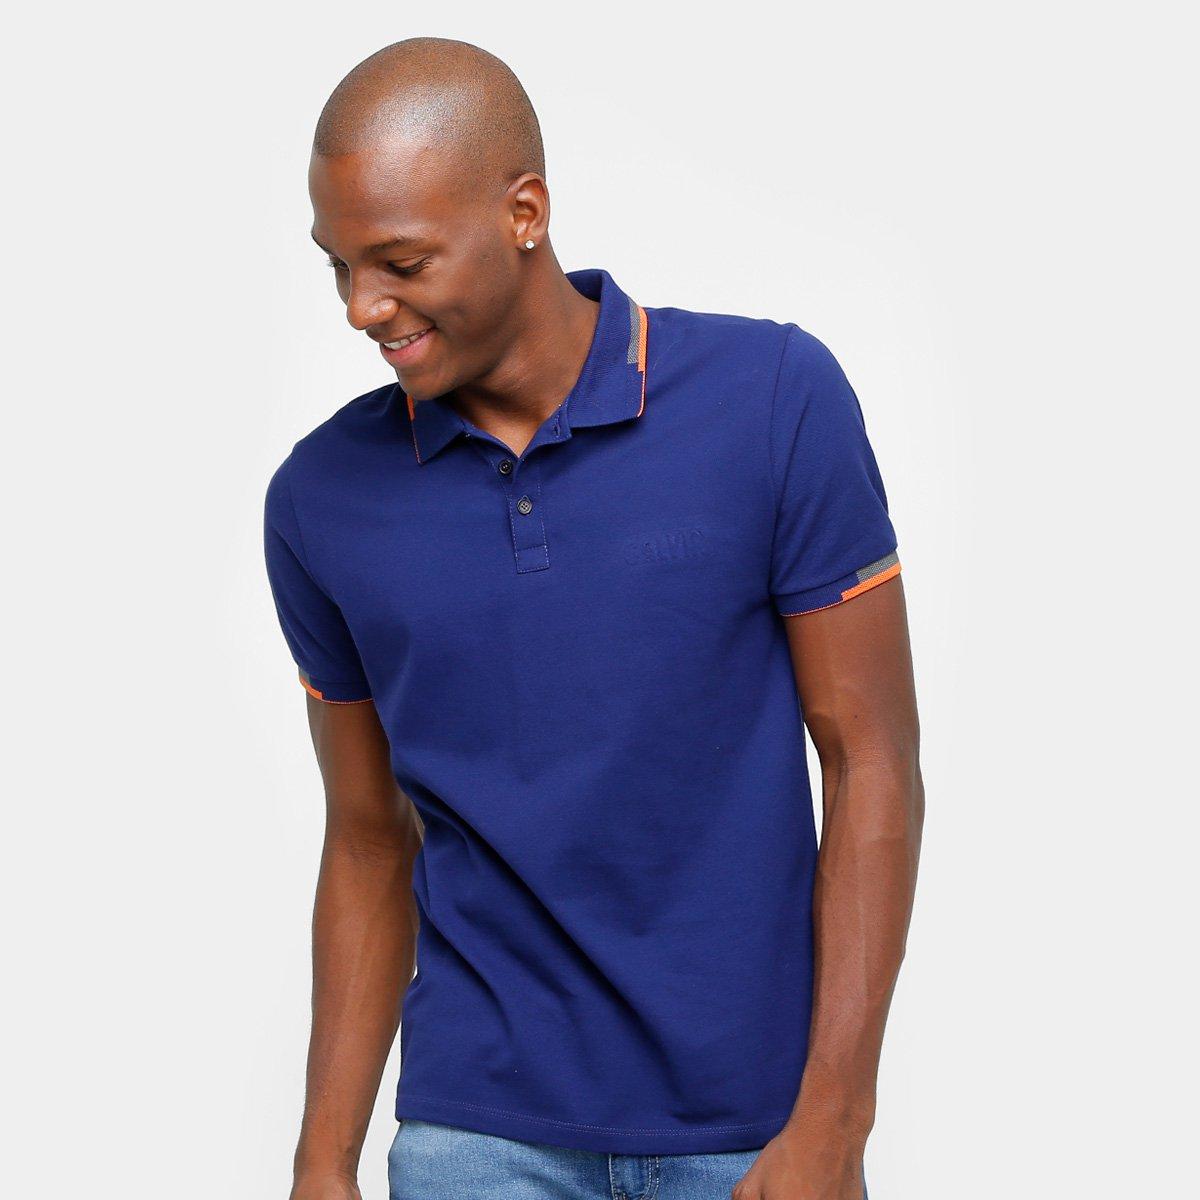 Camisa Polo Calvin Klein Friso Duplo Logo Relevo Masculina - Compre ... c889ea68f493b